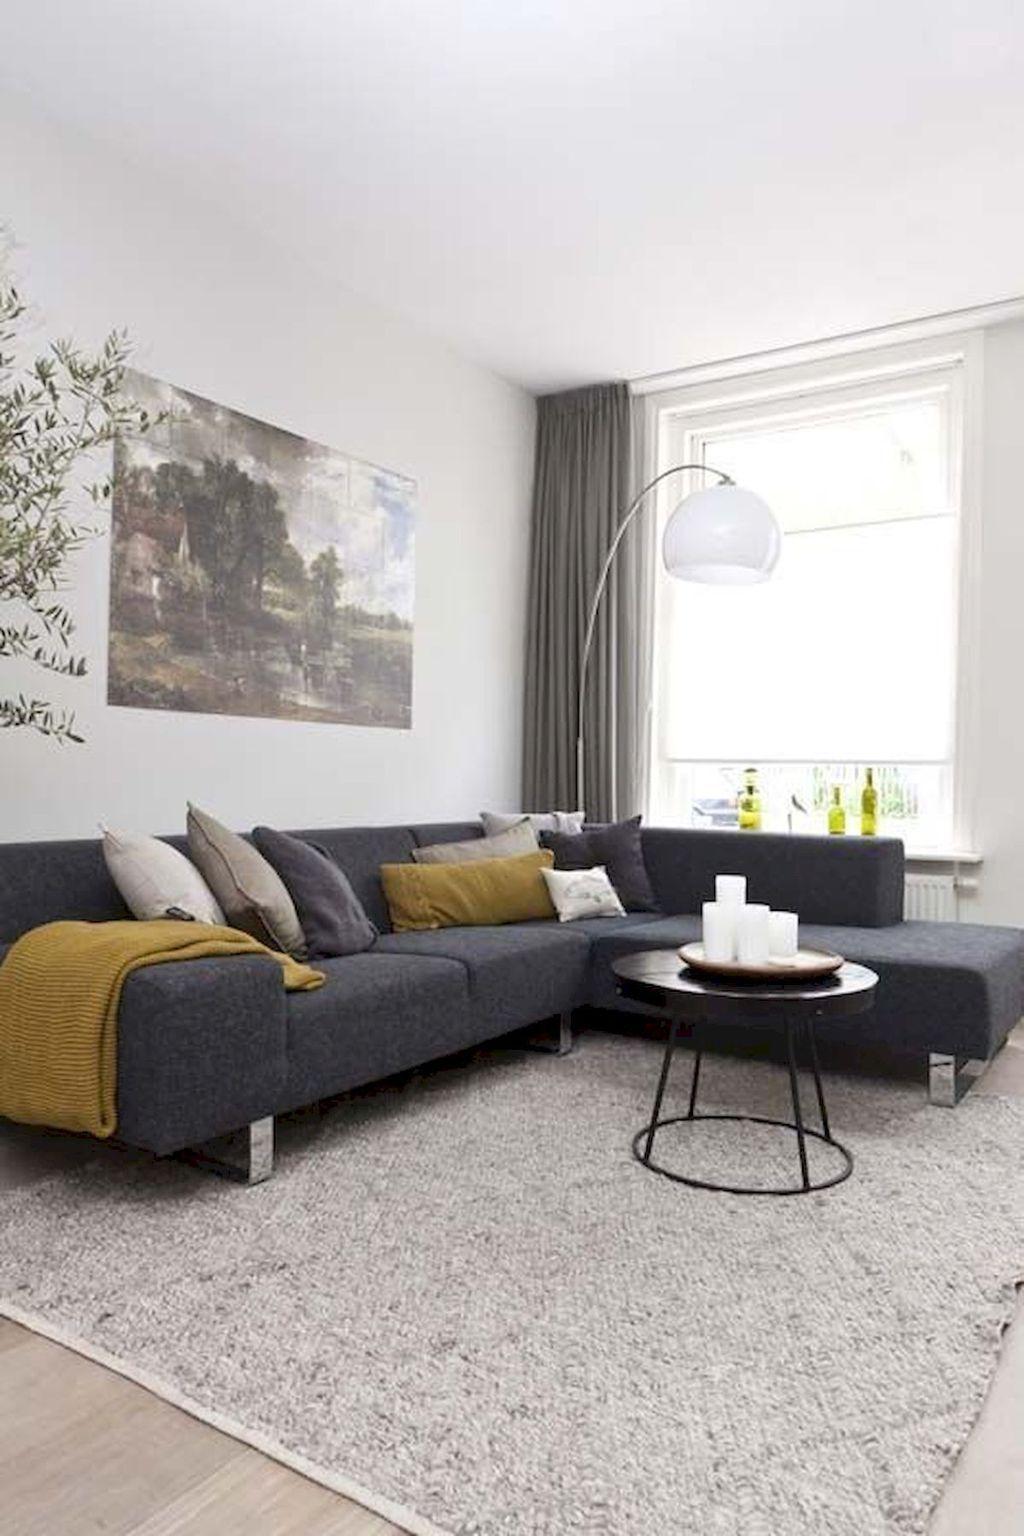 Inspiring Apartment Decorating Ideas On A Budget  Décoration